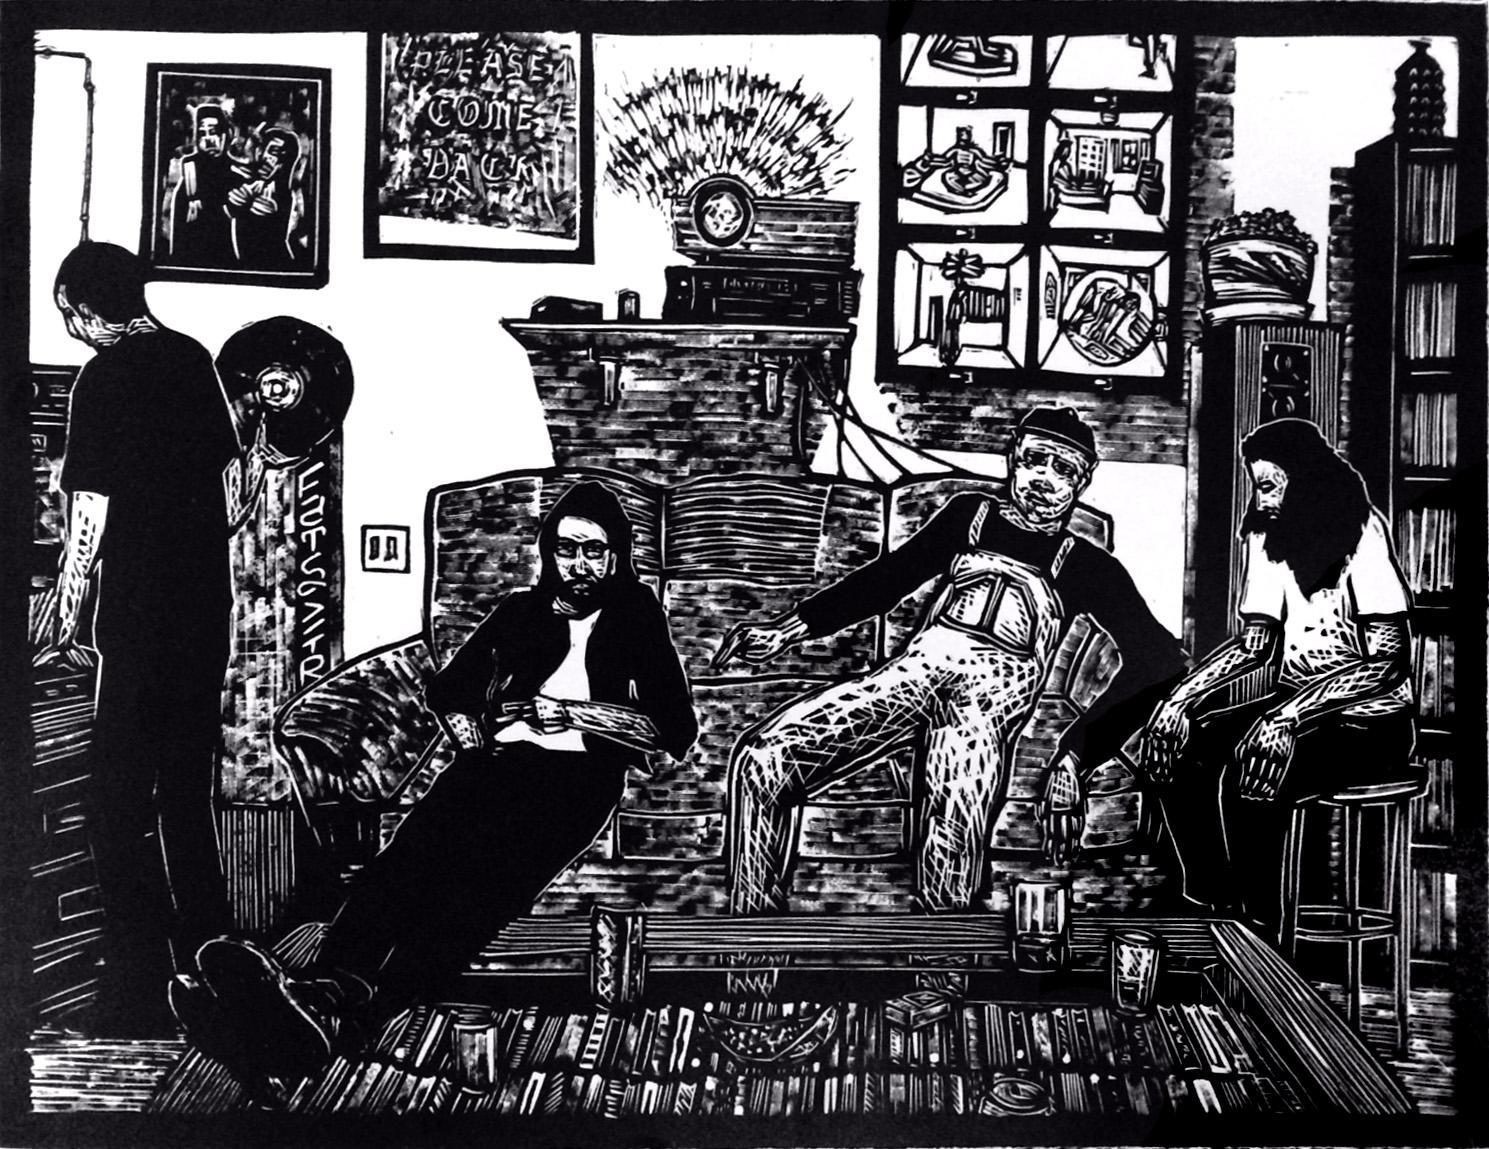 Regulars, 2016, Linoleum